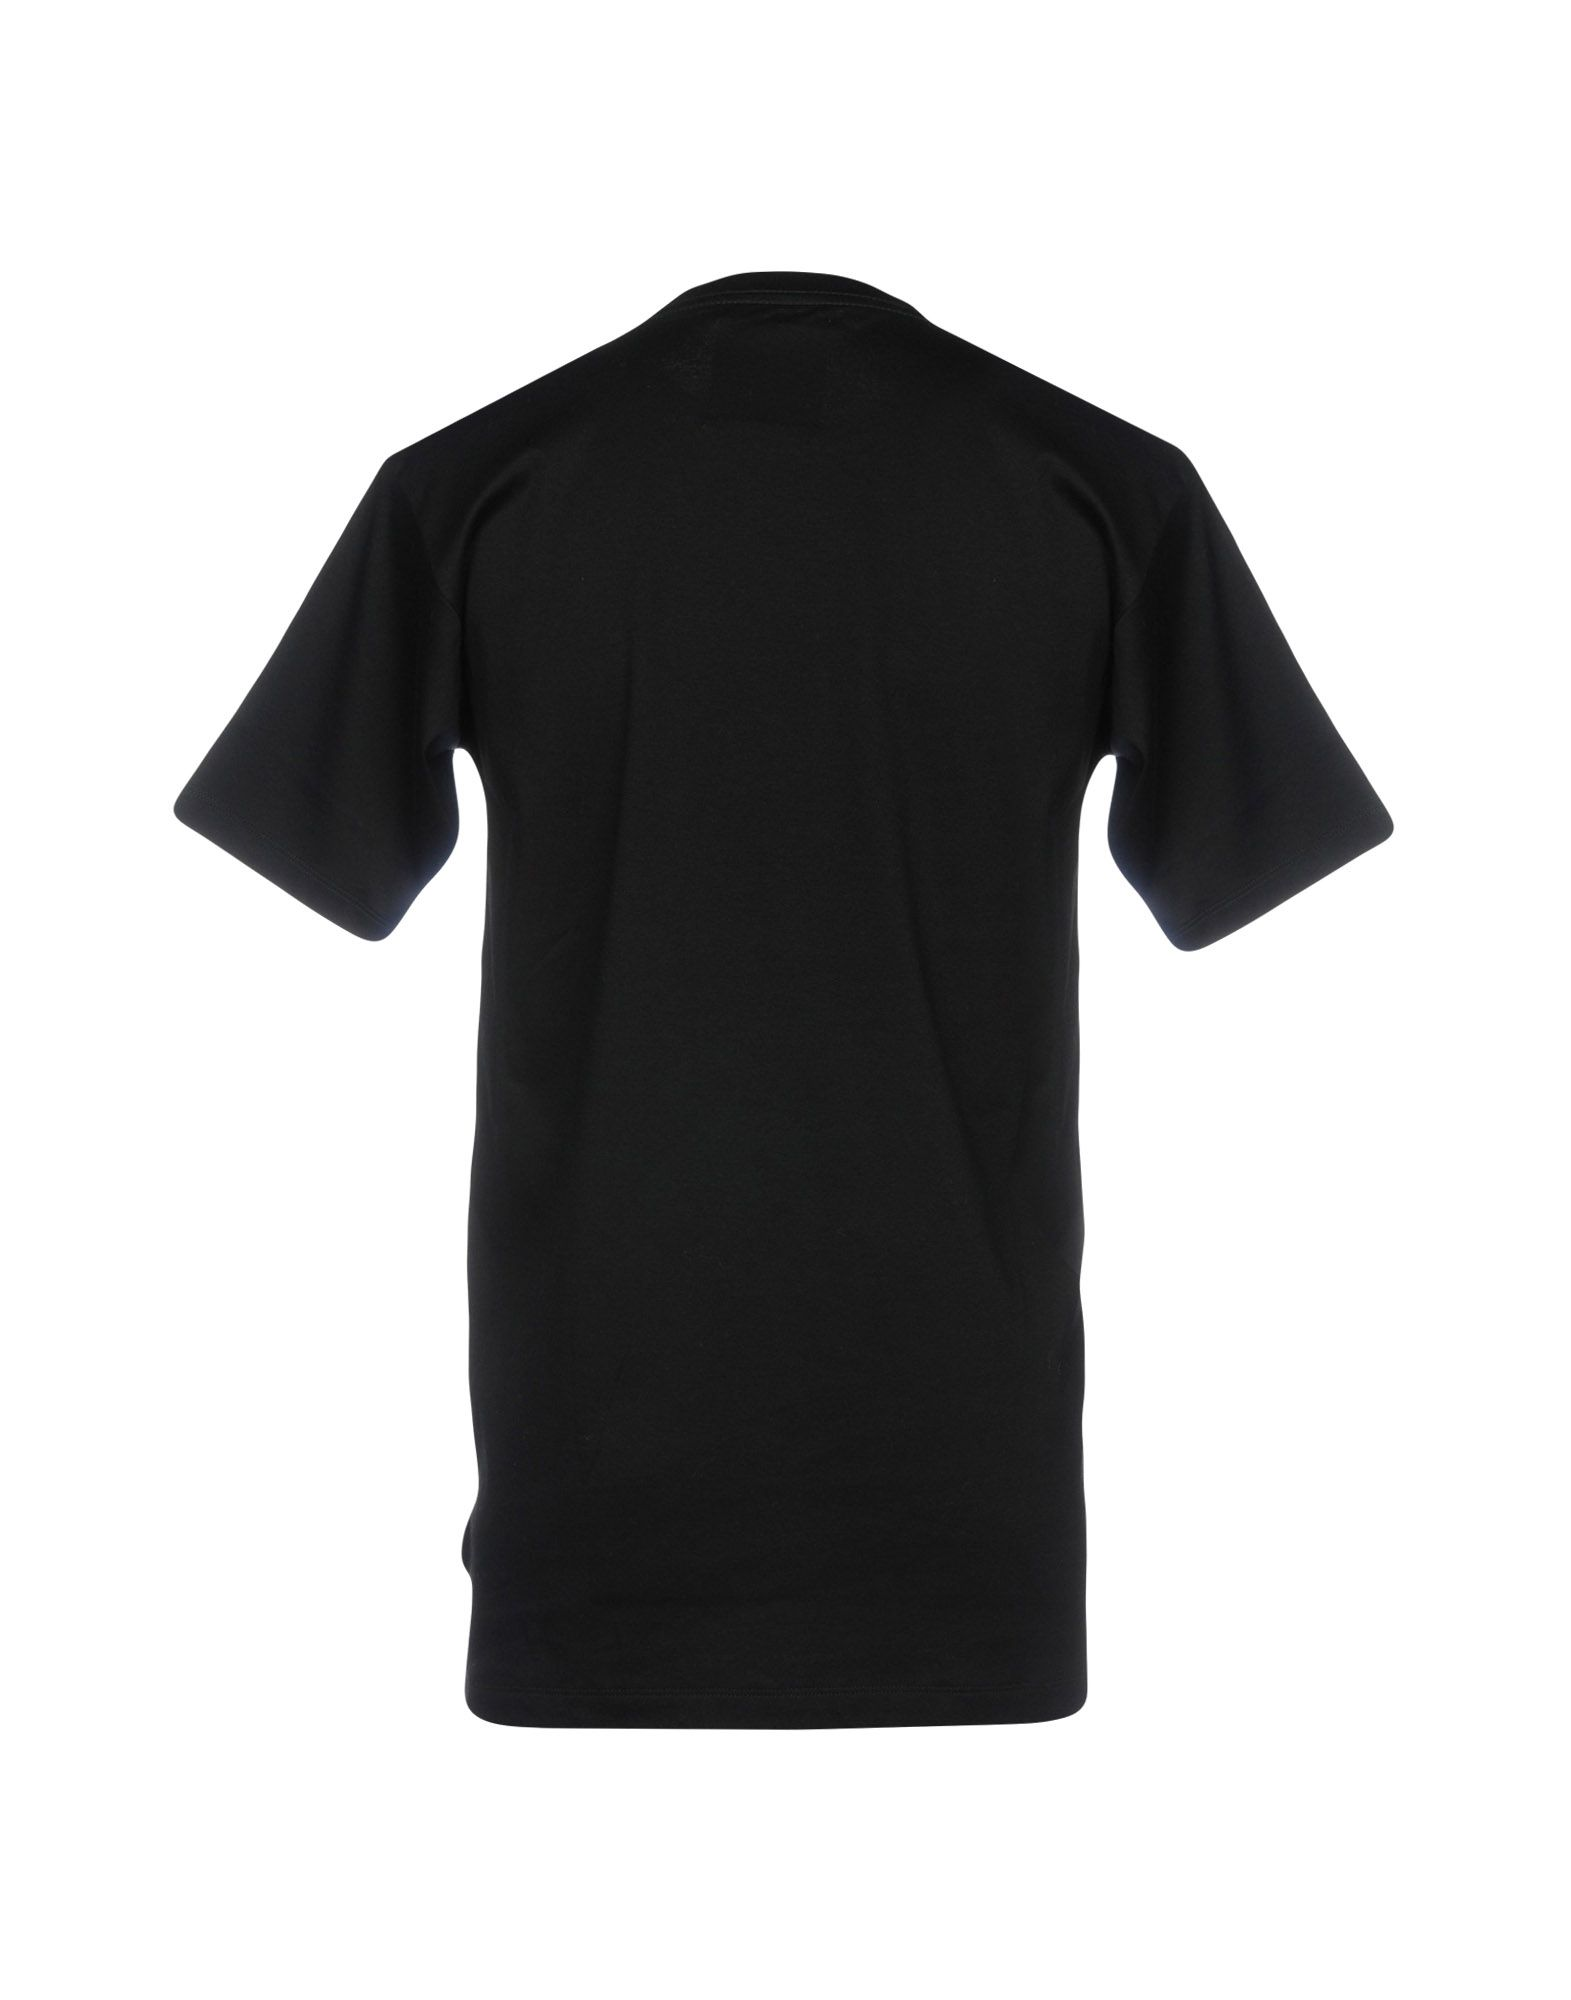 A buon mercato mercato buon A buon mercato T-Shirt Miharayasuhiro Uomo - 12132513BU 89bb38